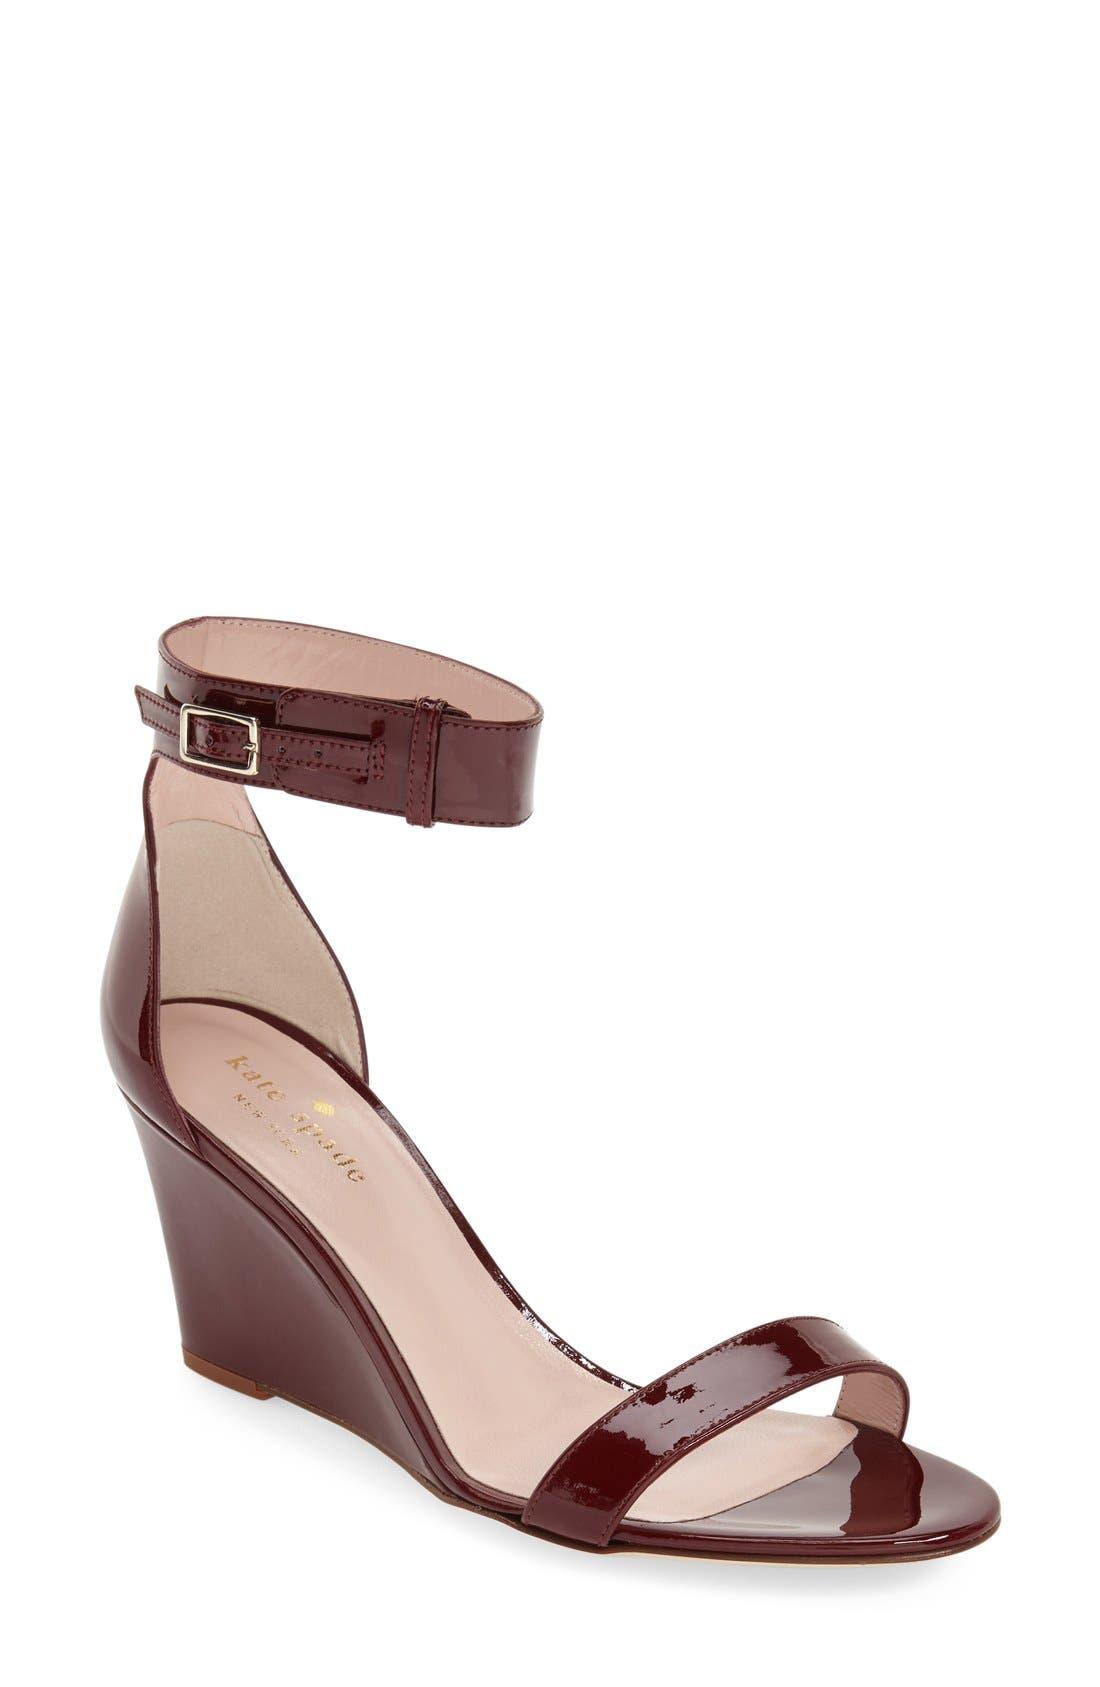 Alternate Image 1 Selected - kate spade new york 'ronia' wedge sandal (Women)